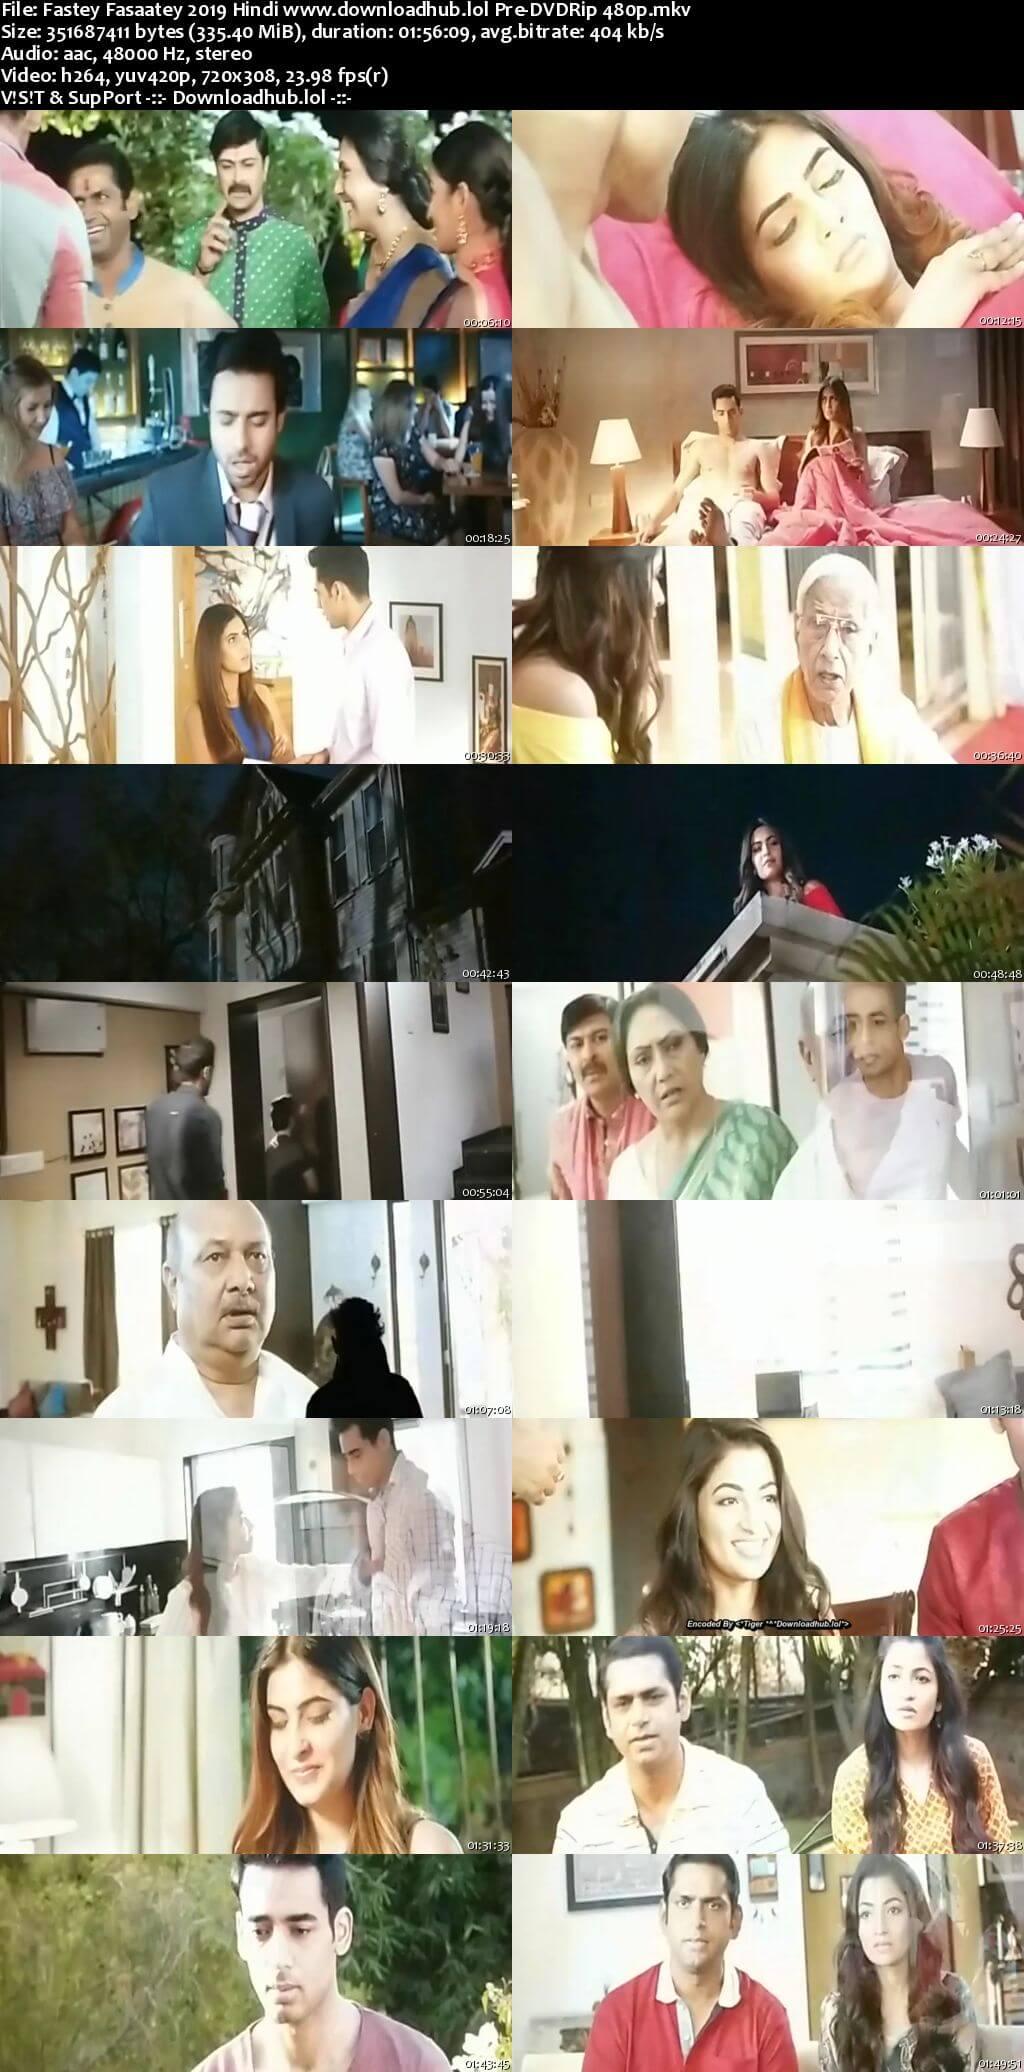 Fastey Fasaatey 2019 Hindi 300MB Pre-DVDRip 480p